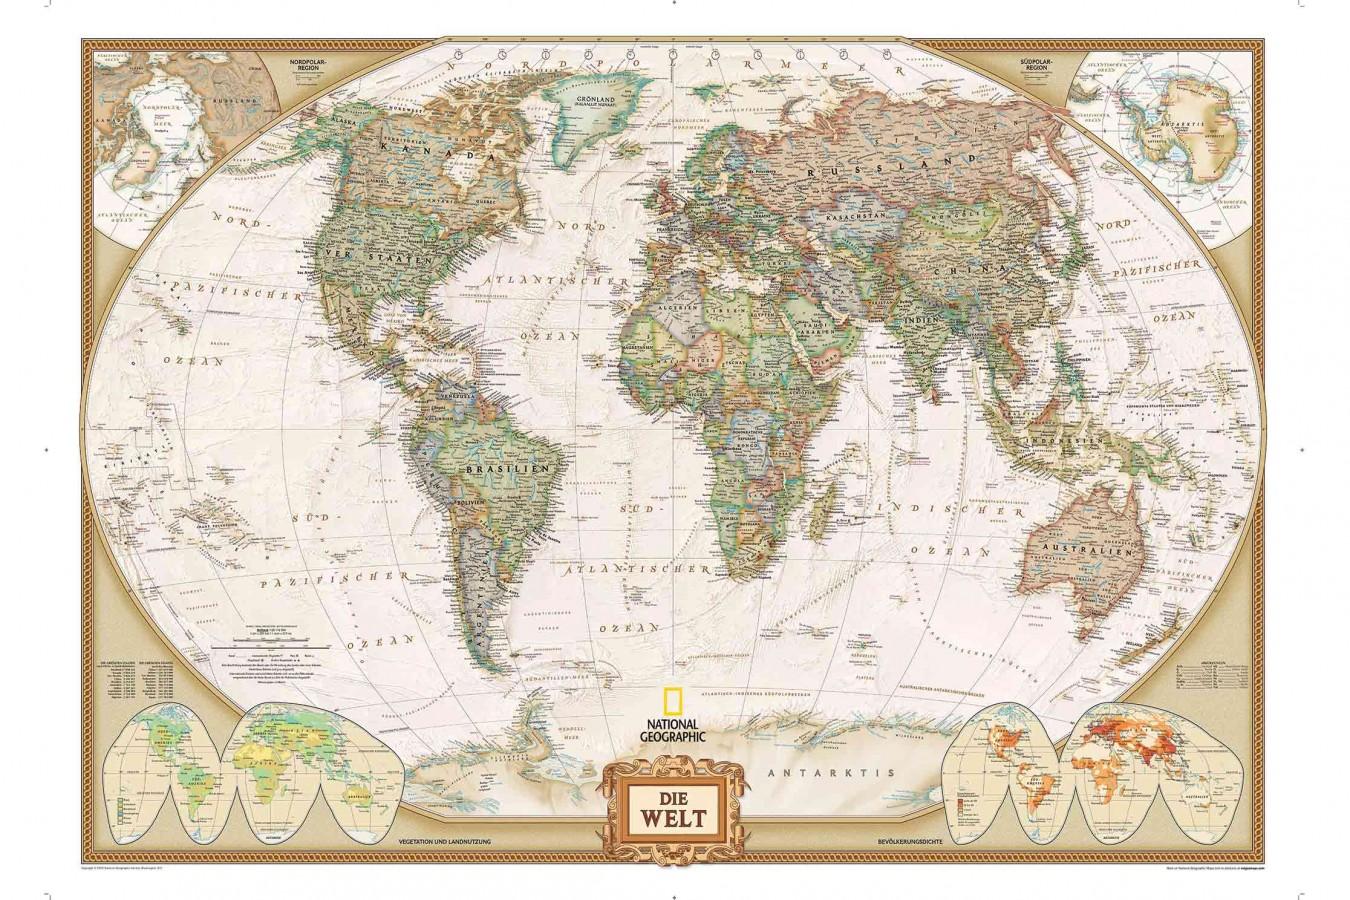 Fotomural German World Map A08-M900 Fotomural German World Map A08-M900